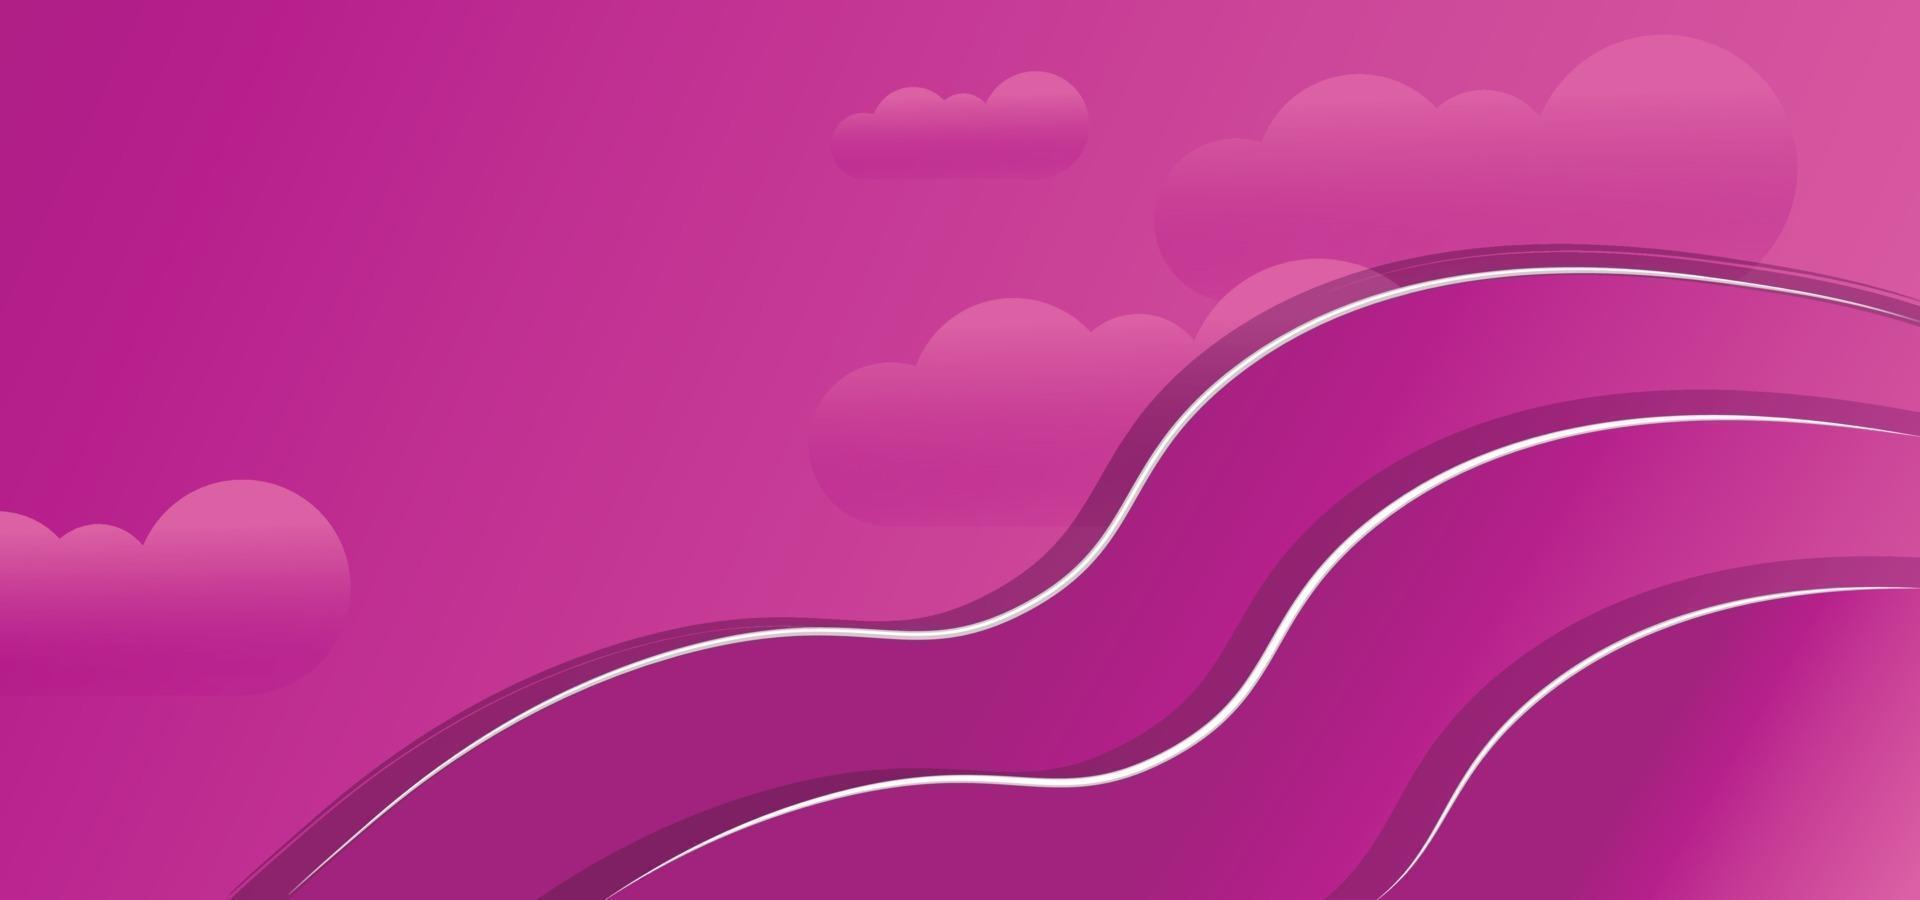 abstracte wolken geometrische vormen mooie achtergrond of banner vector